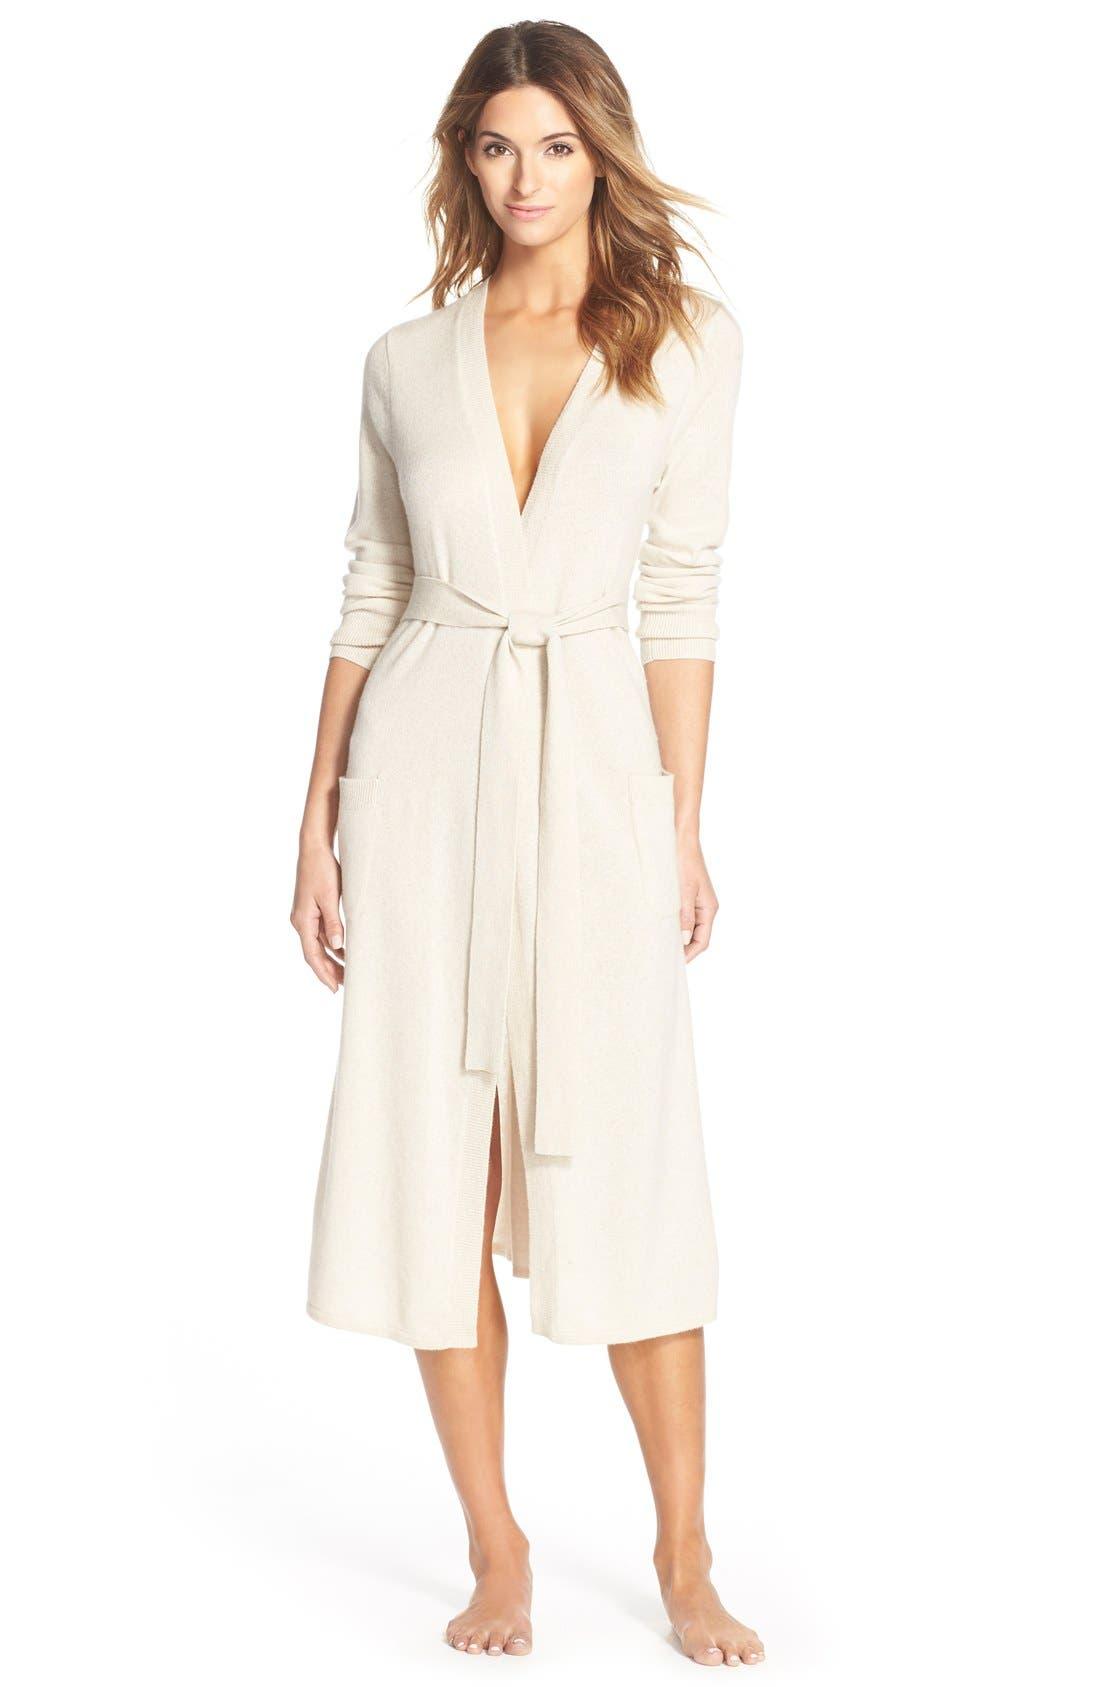 Alternate Image 1 Selected - Nordstrom Lingerie Cashmere Robe